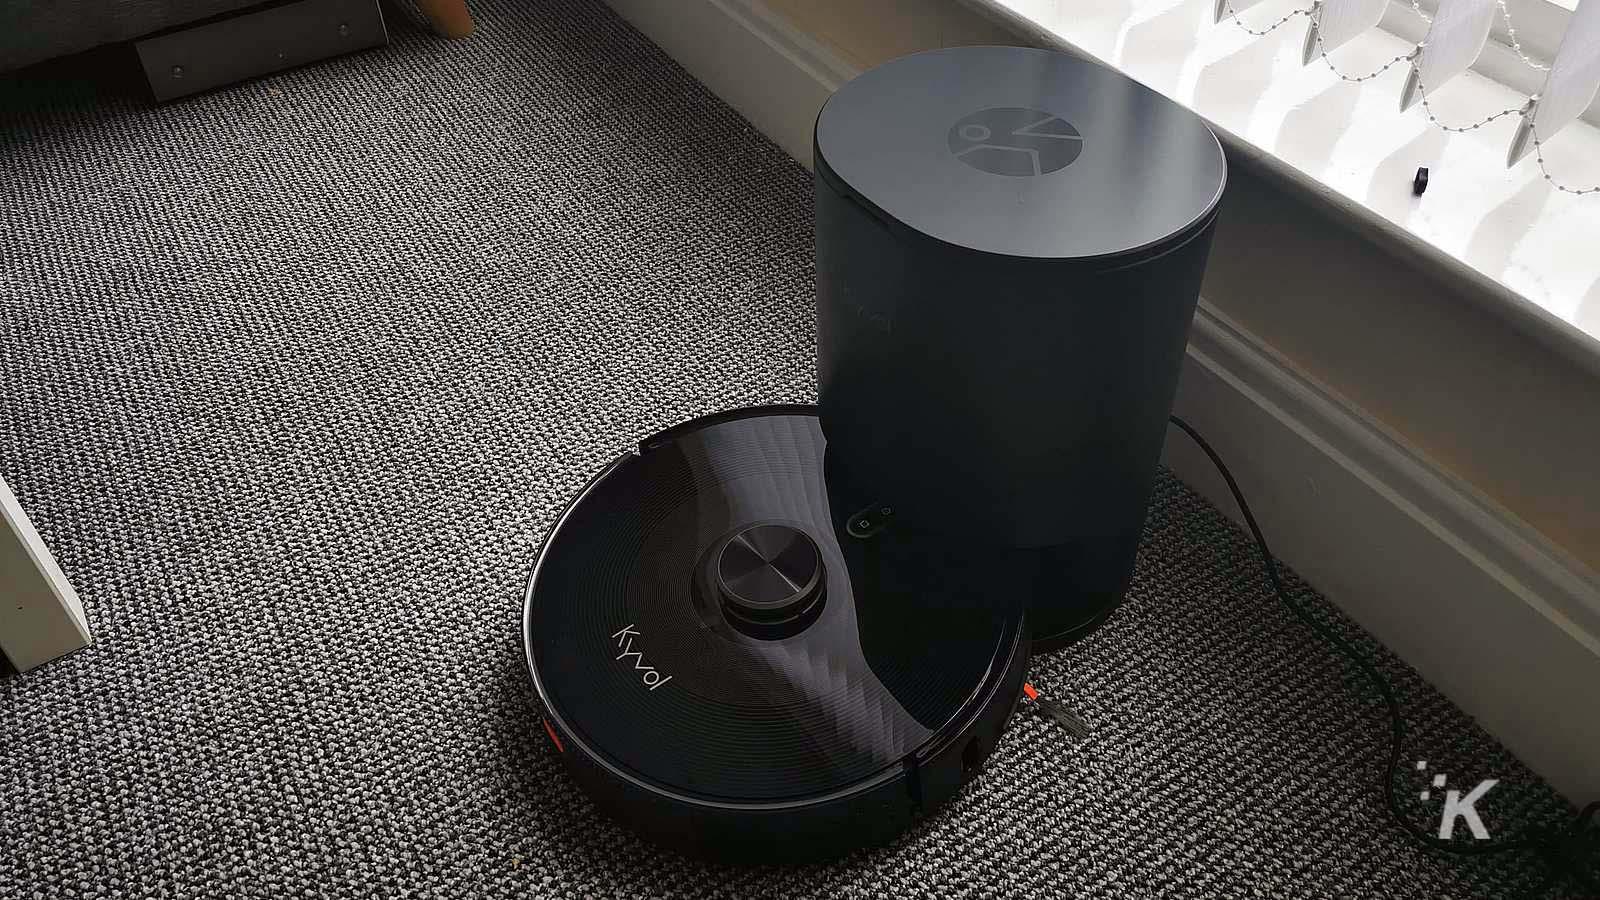 kyvol vacuum with dustbin